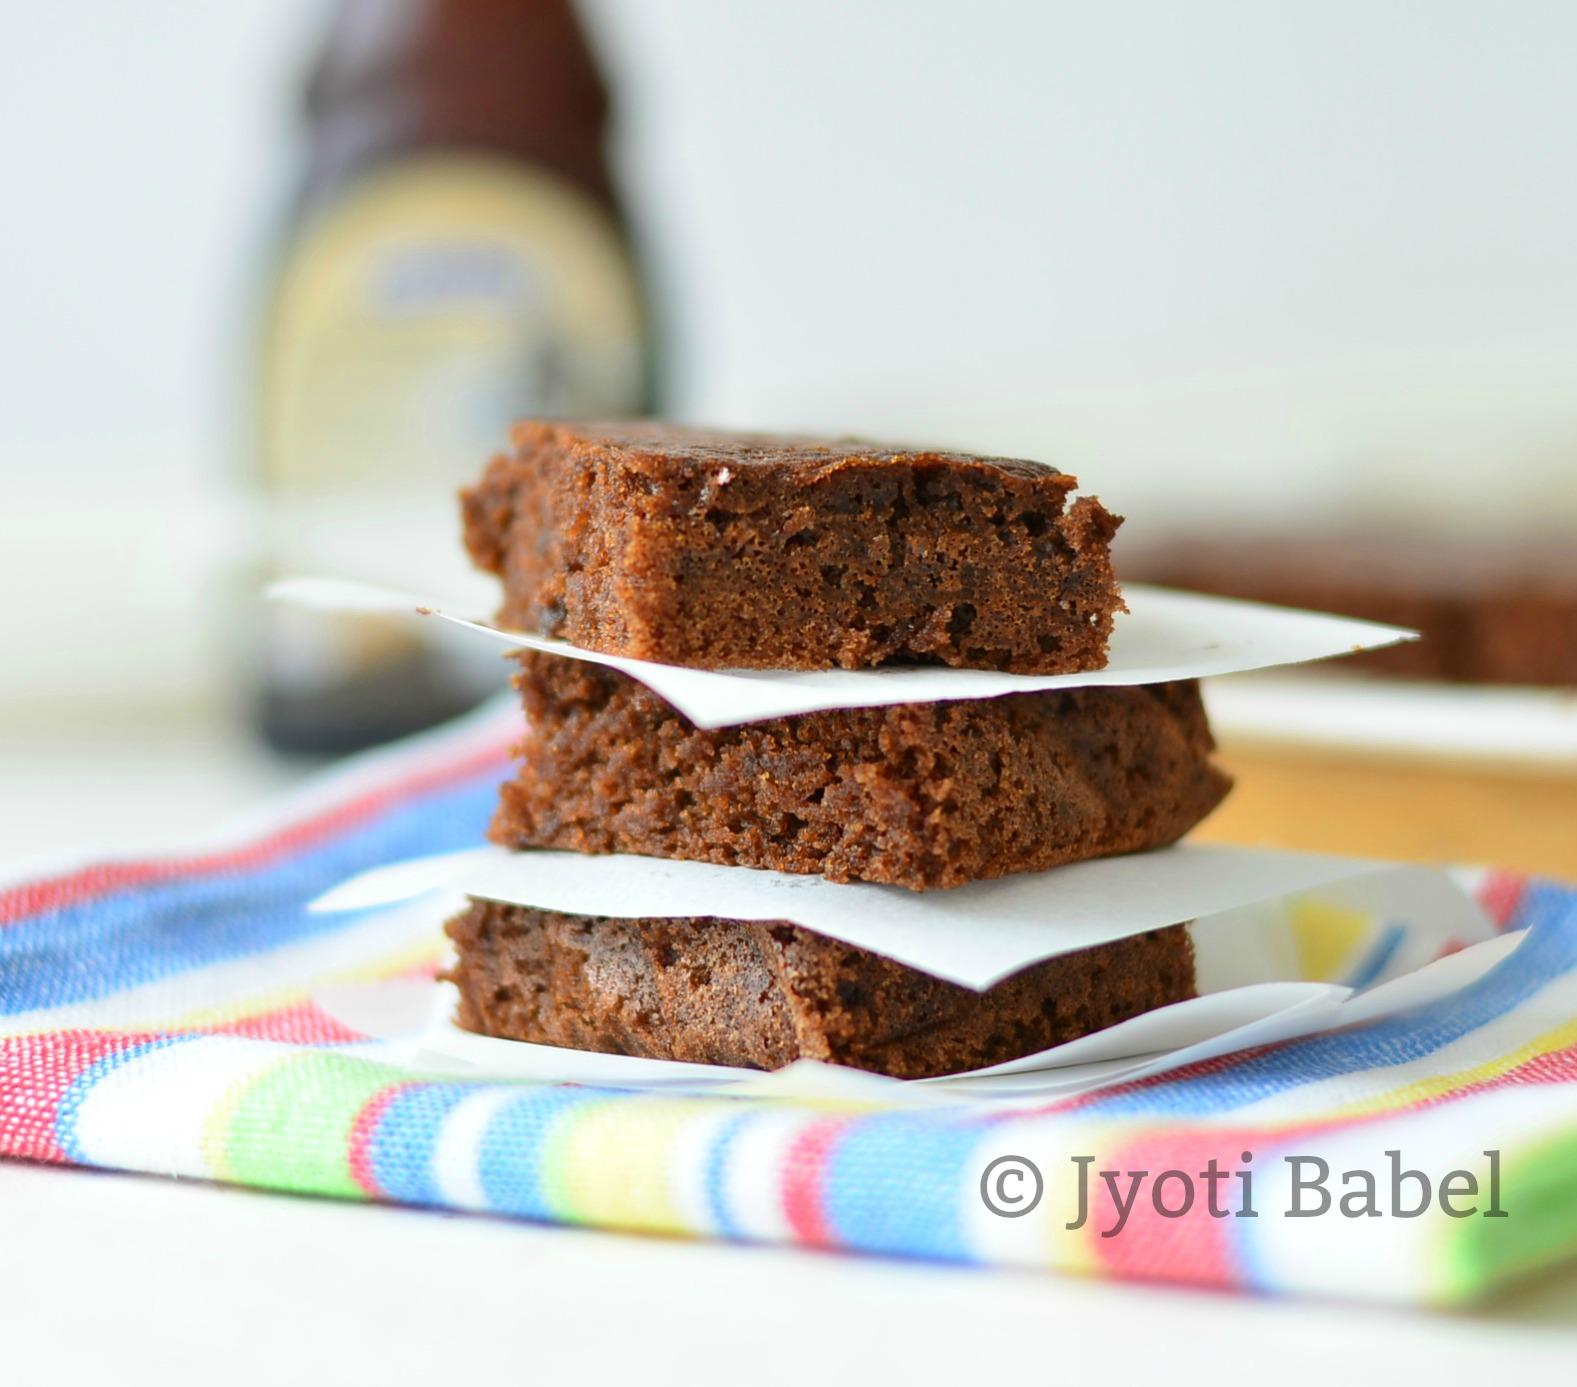 Jyoti's Pages: Bourbon Biscuit Brownies